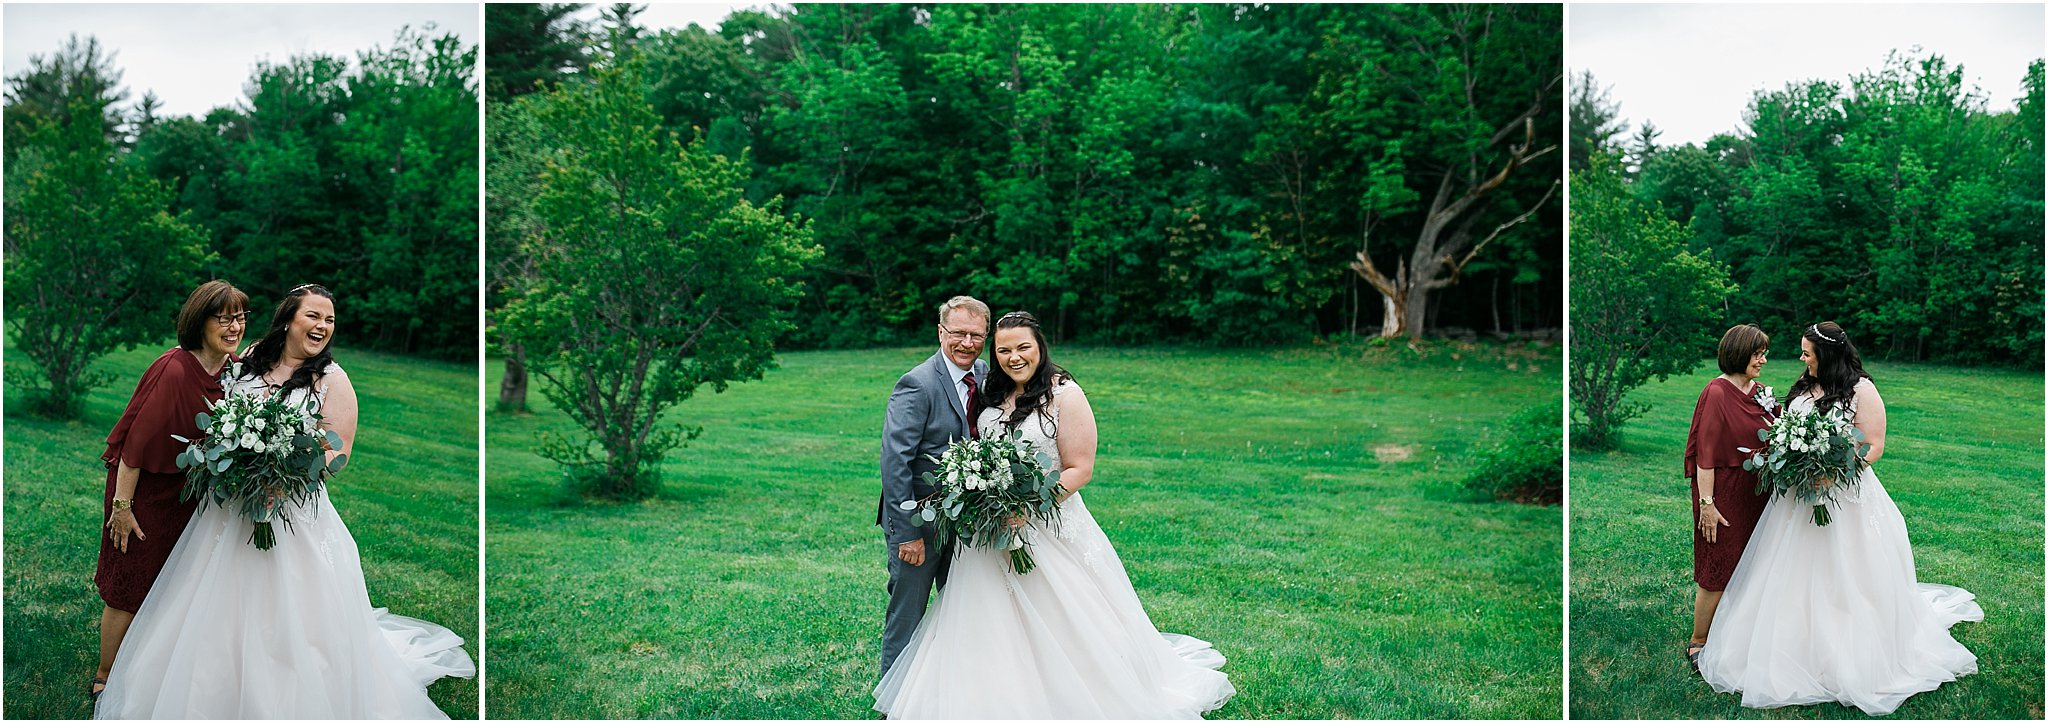 Preserve at Chocorua Tamworth NH Wedding May Wedding New Hampshire Wedding 45.jpg